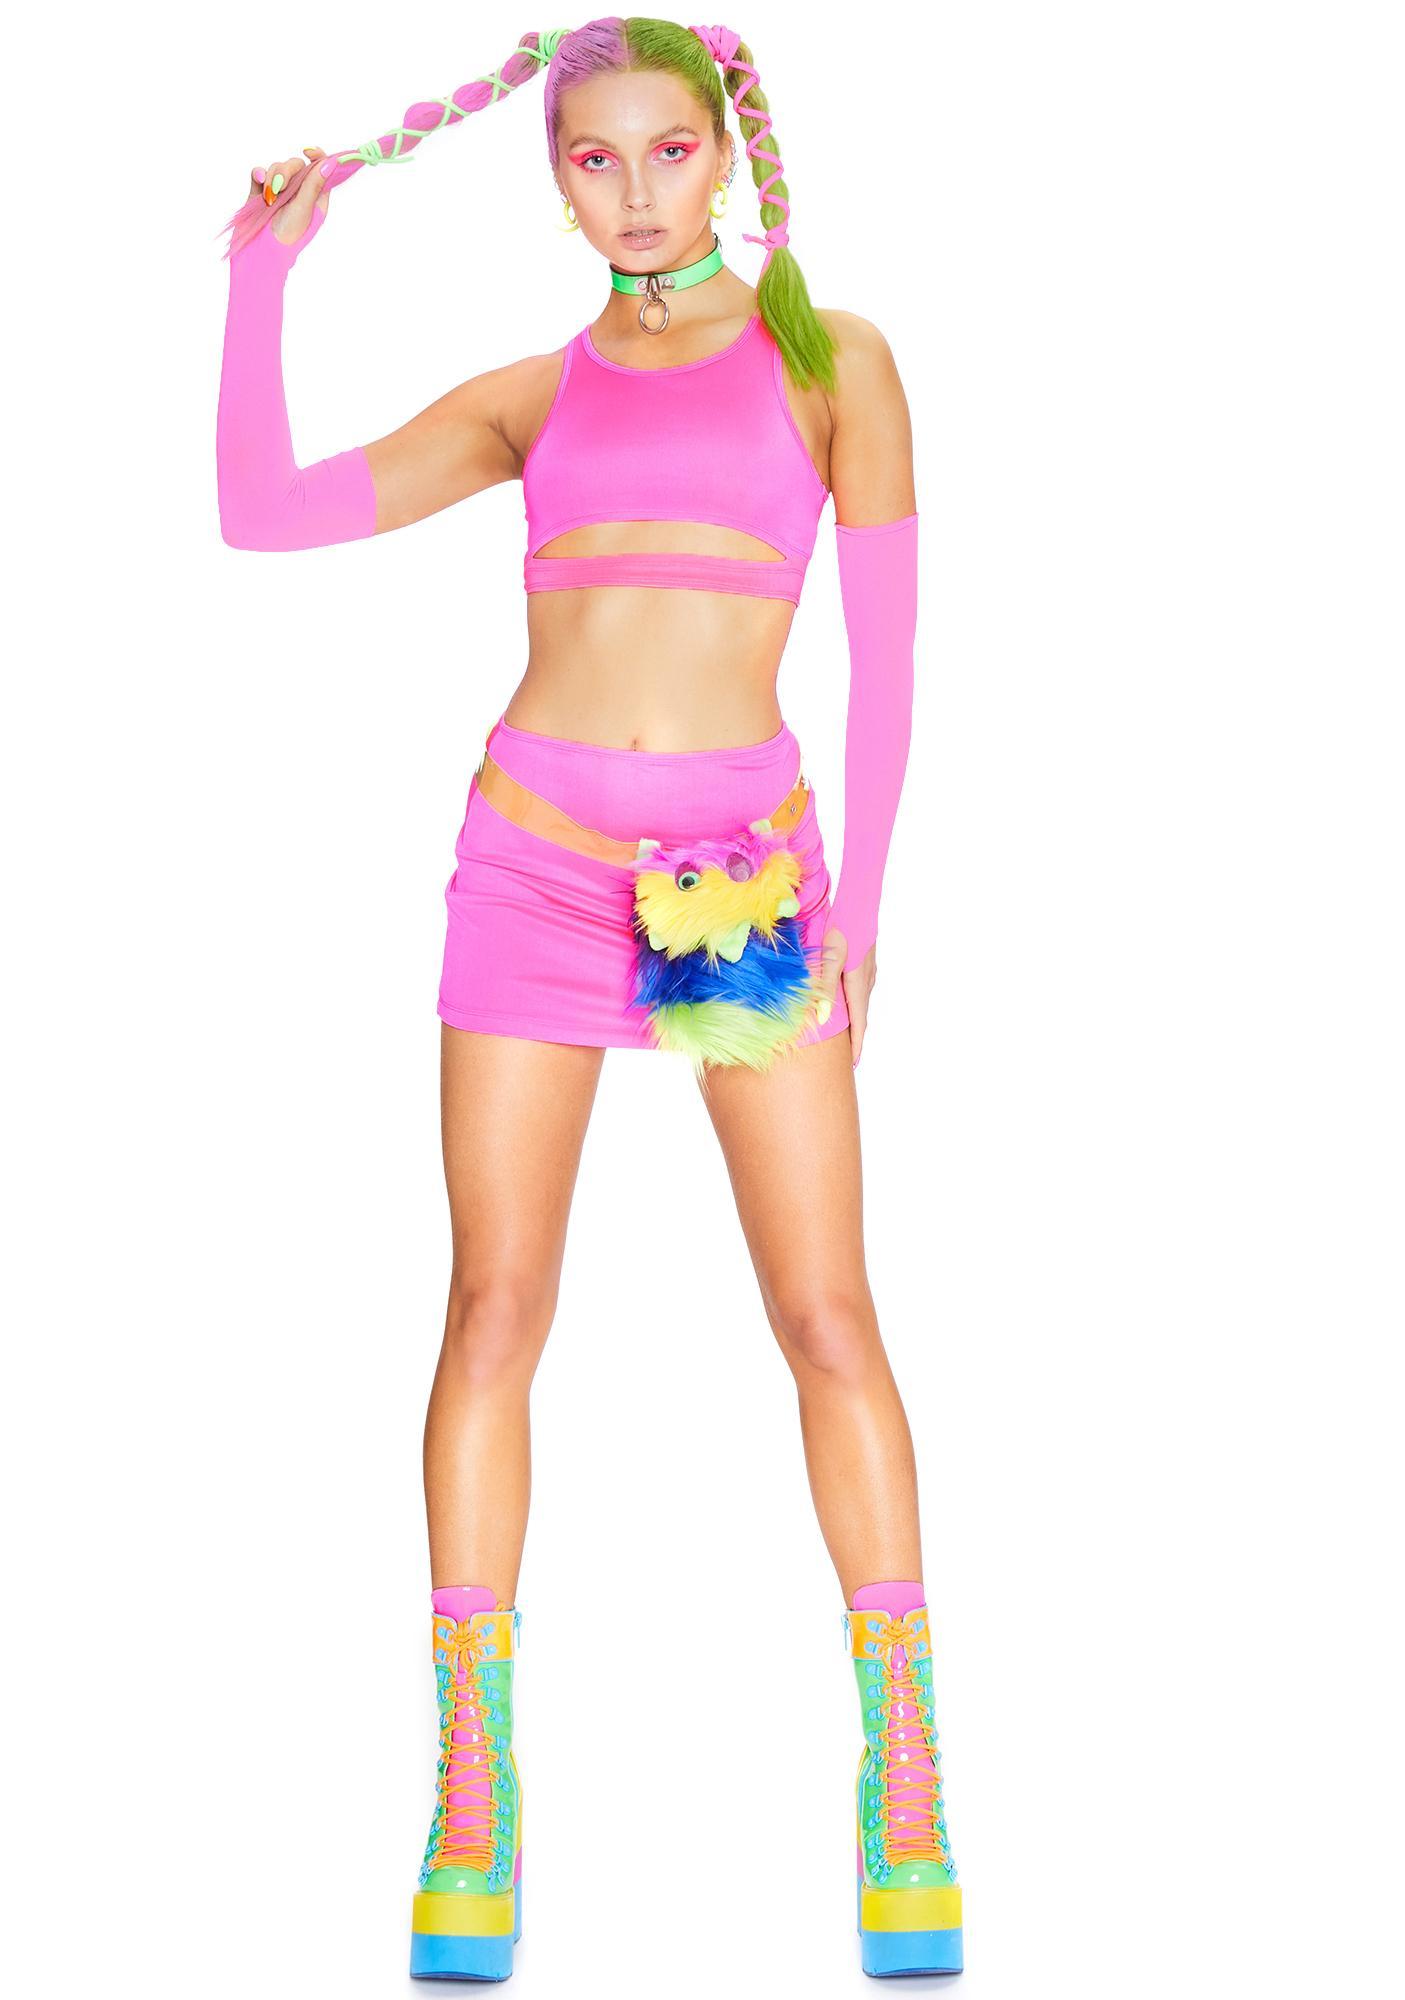 Club Exx Pixie Flash Delirium Skirt Set